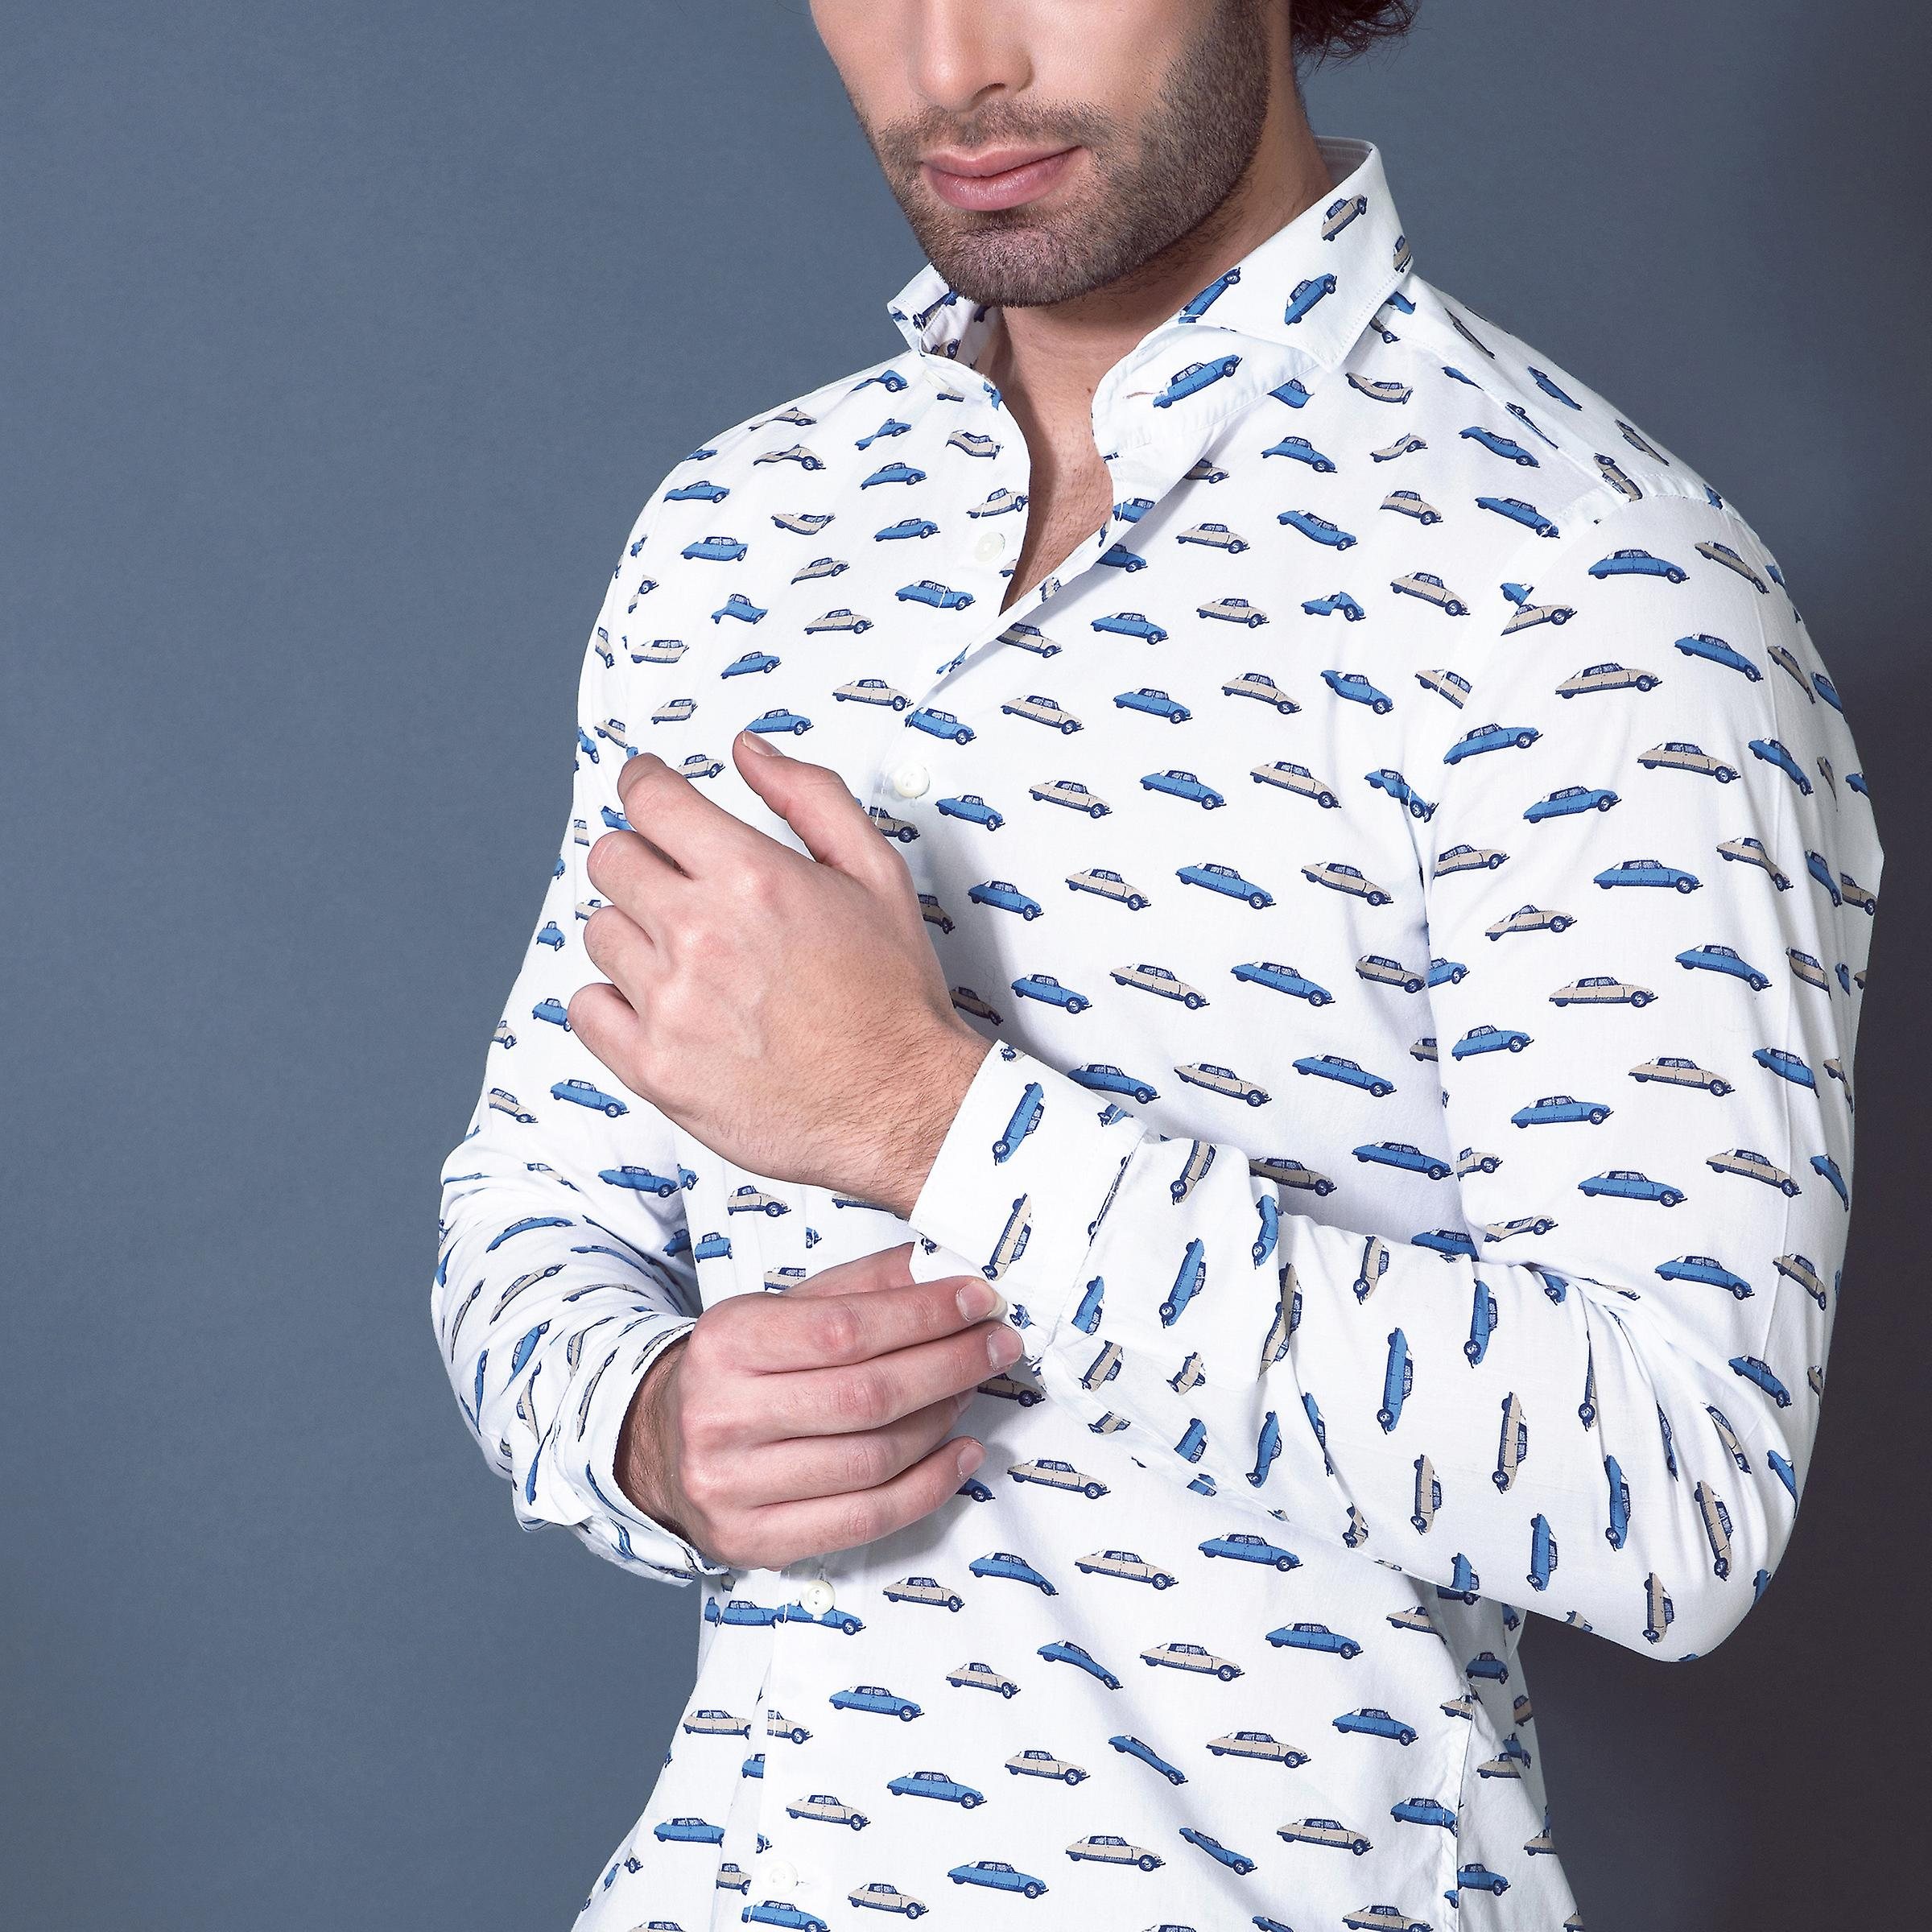 Fabio Giovanni Gallipoli Shirt - Mens italienische lässige Retro-Print-Shirt - Langarm